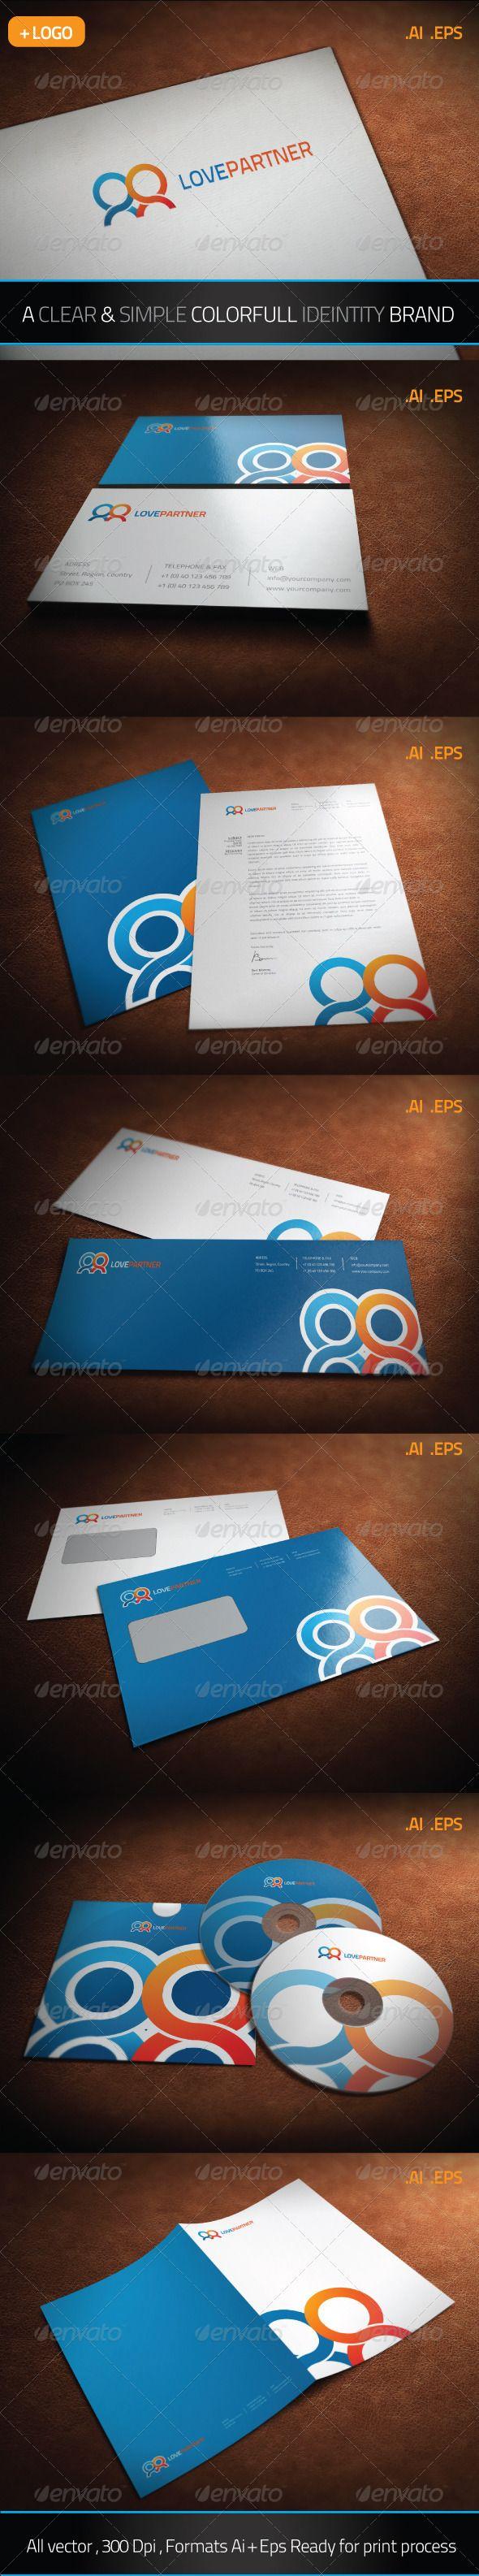 Love Partners Brand Identity